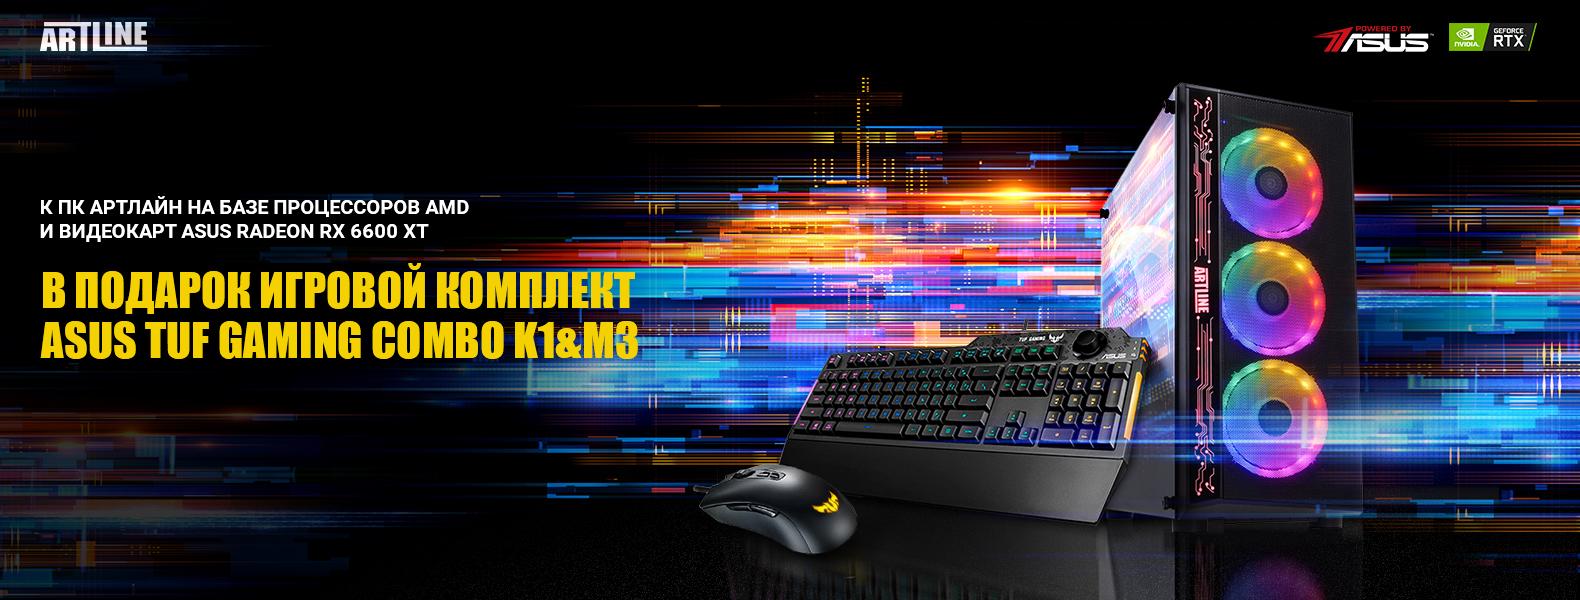 Каждому покупателю ПК Артлайн на базе видеокарт ASUS Radeon RX 6600 XT дарим игровой комплект ASUS TUF Gaming Combo K1&M3